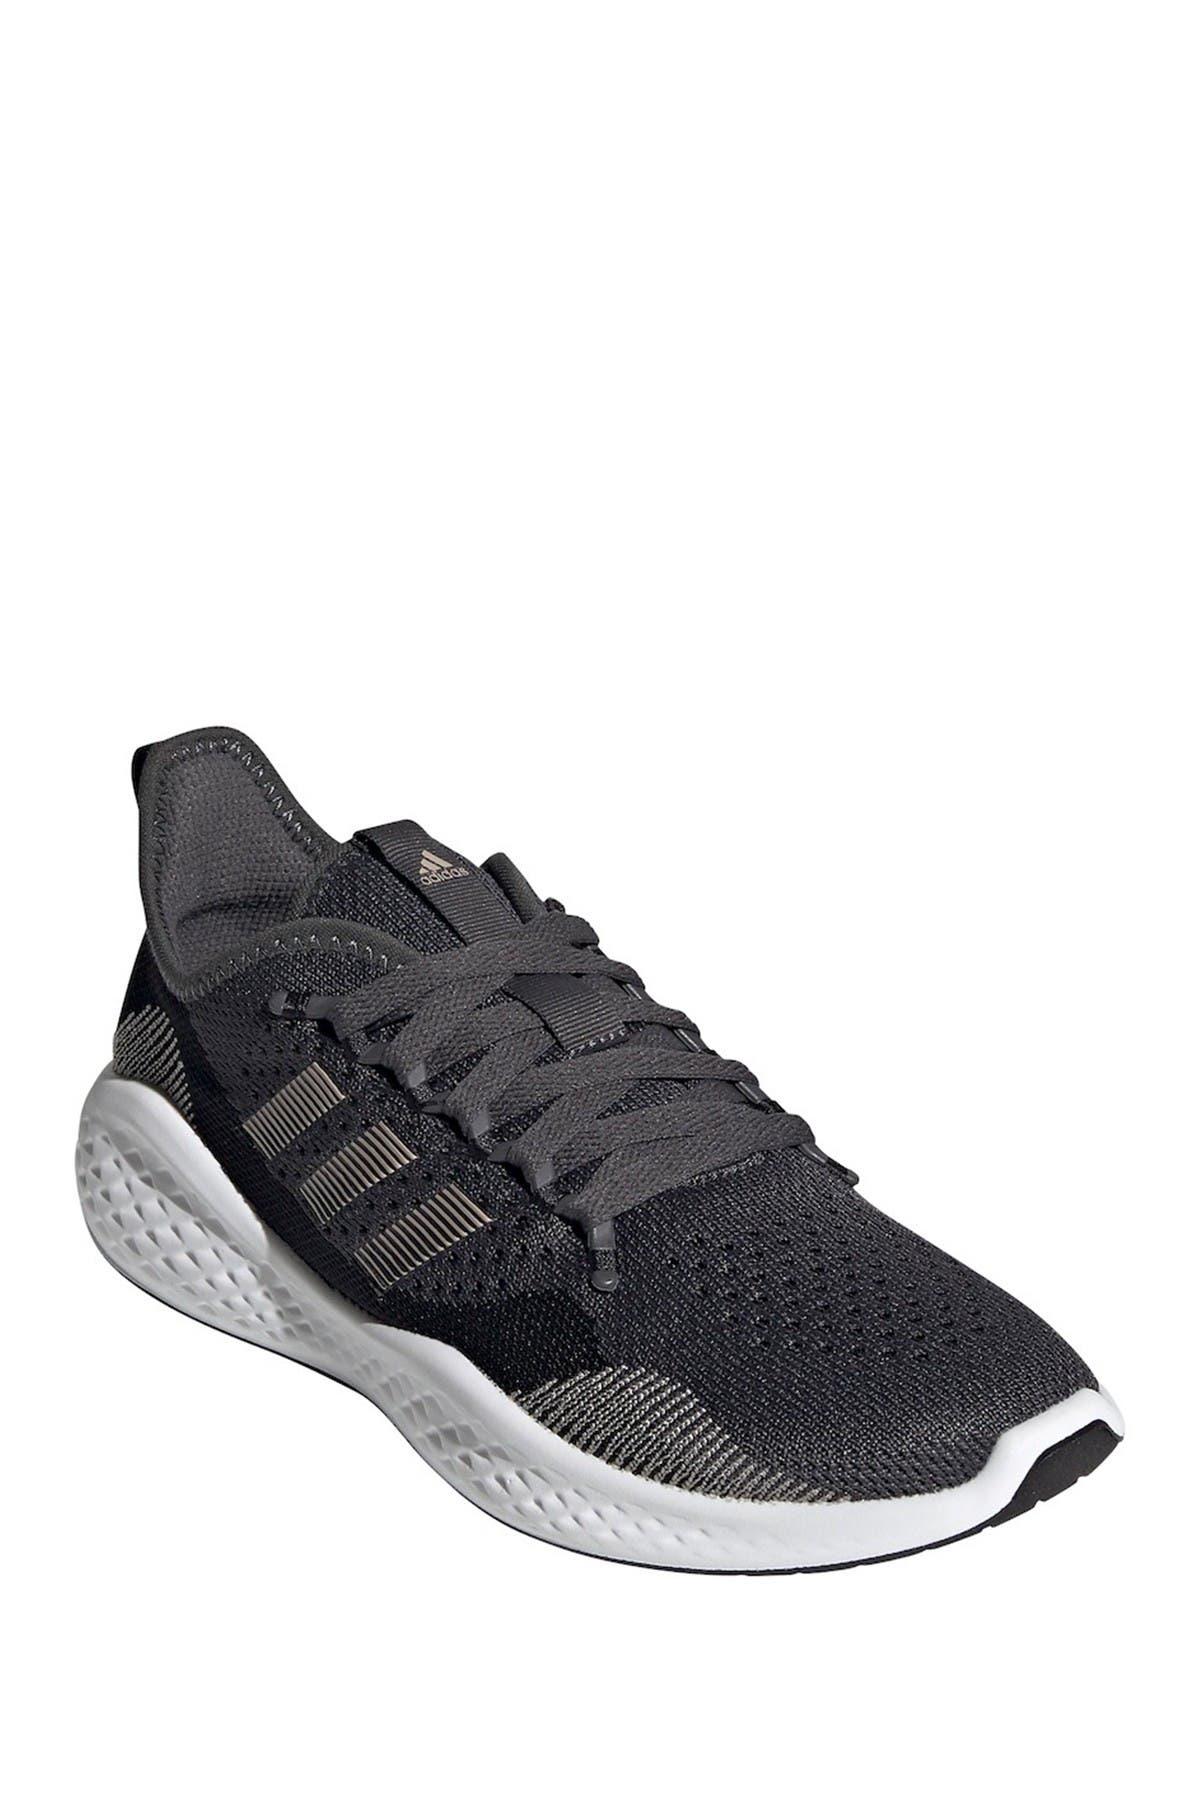 Image of adidas Fluidflow 2.0 Sneaker